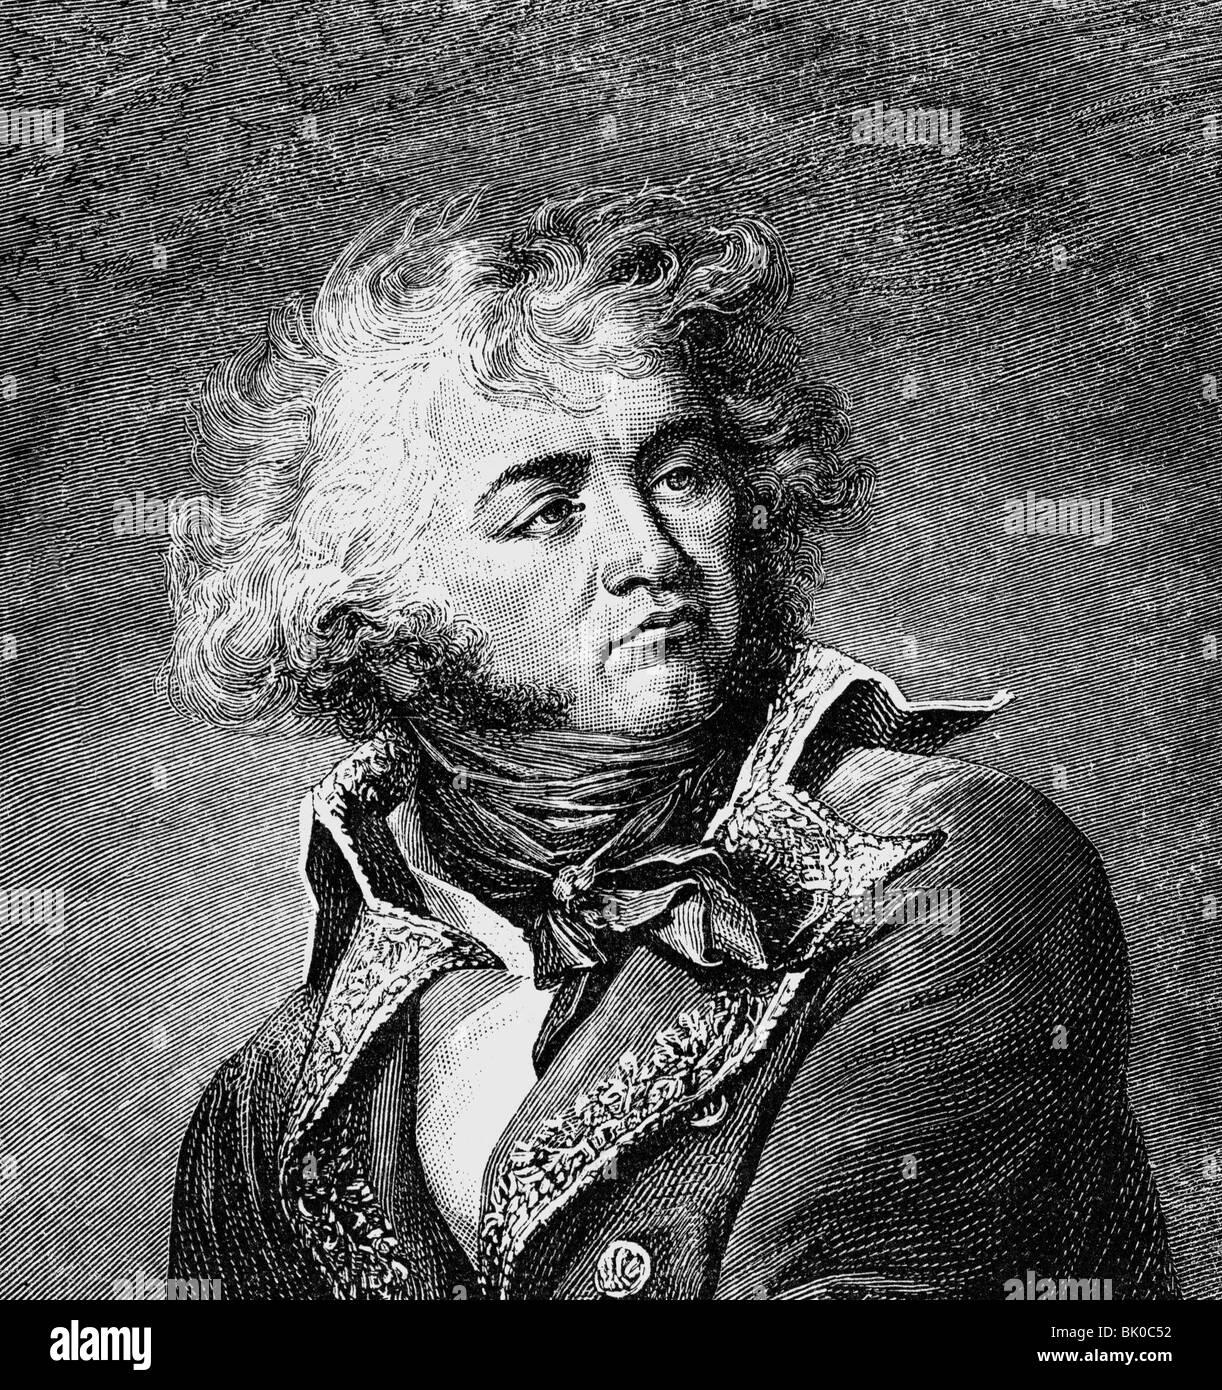 Kléber, Jean Baptiste, 9.3.1753 - 14.6.1800, general francés, retrato, grabado en madera después Imagen De Stock